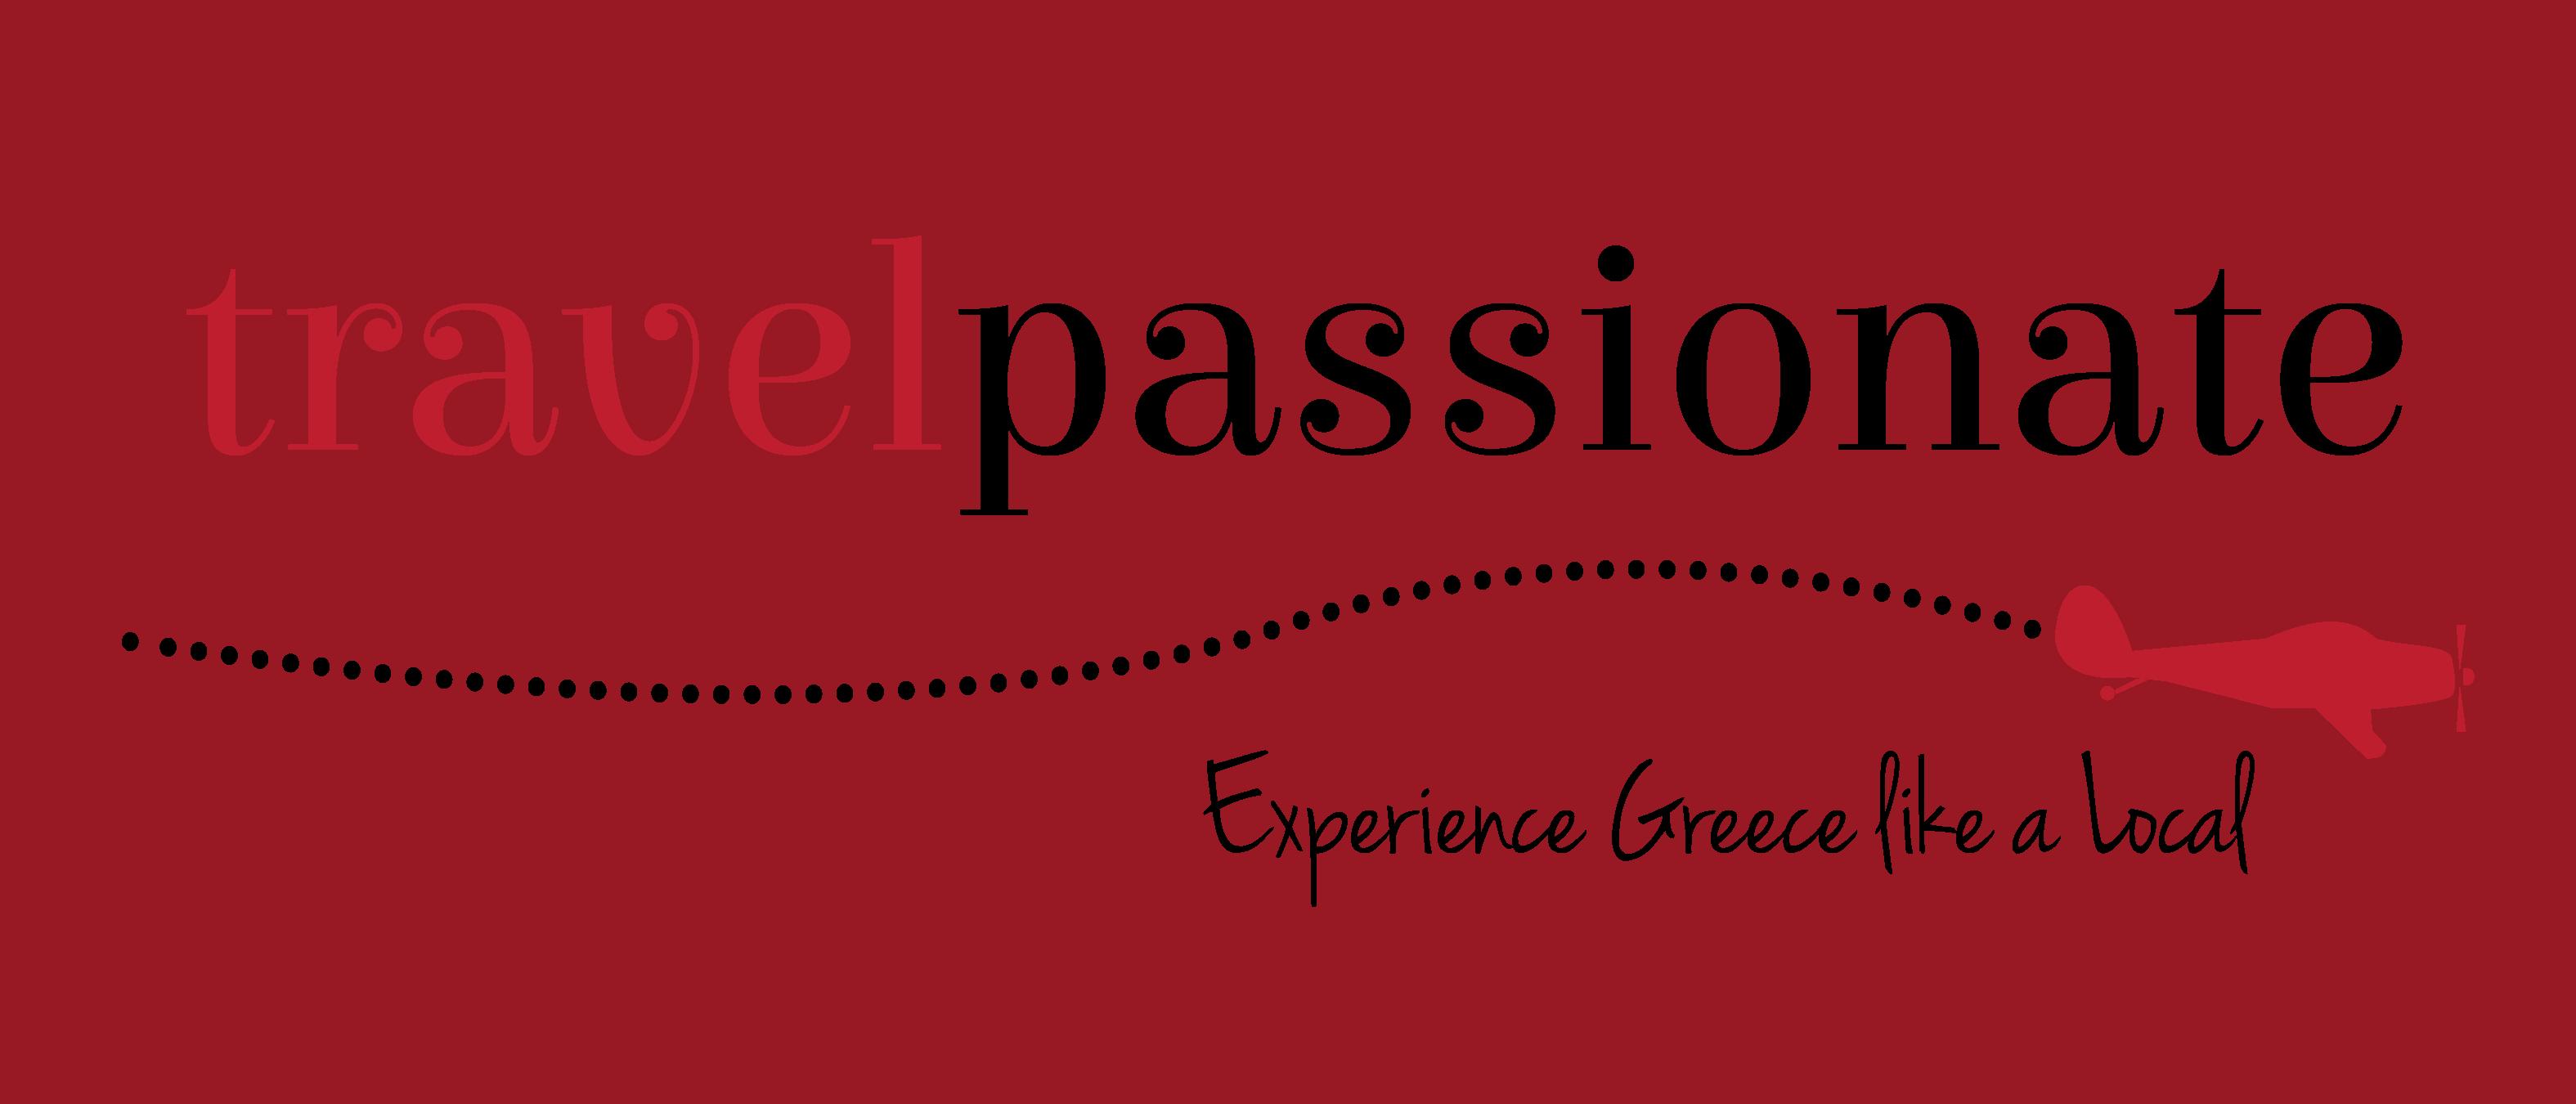 travelpassionate.com